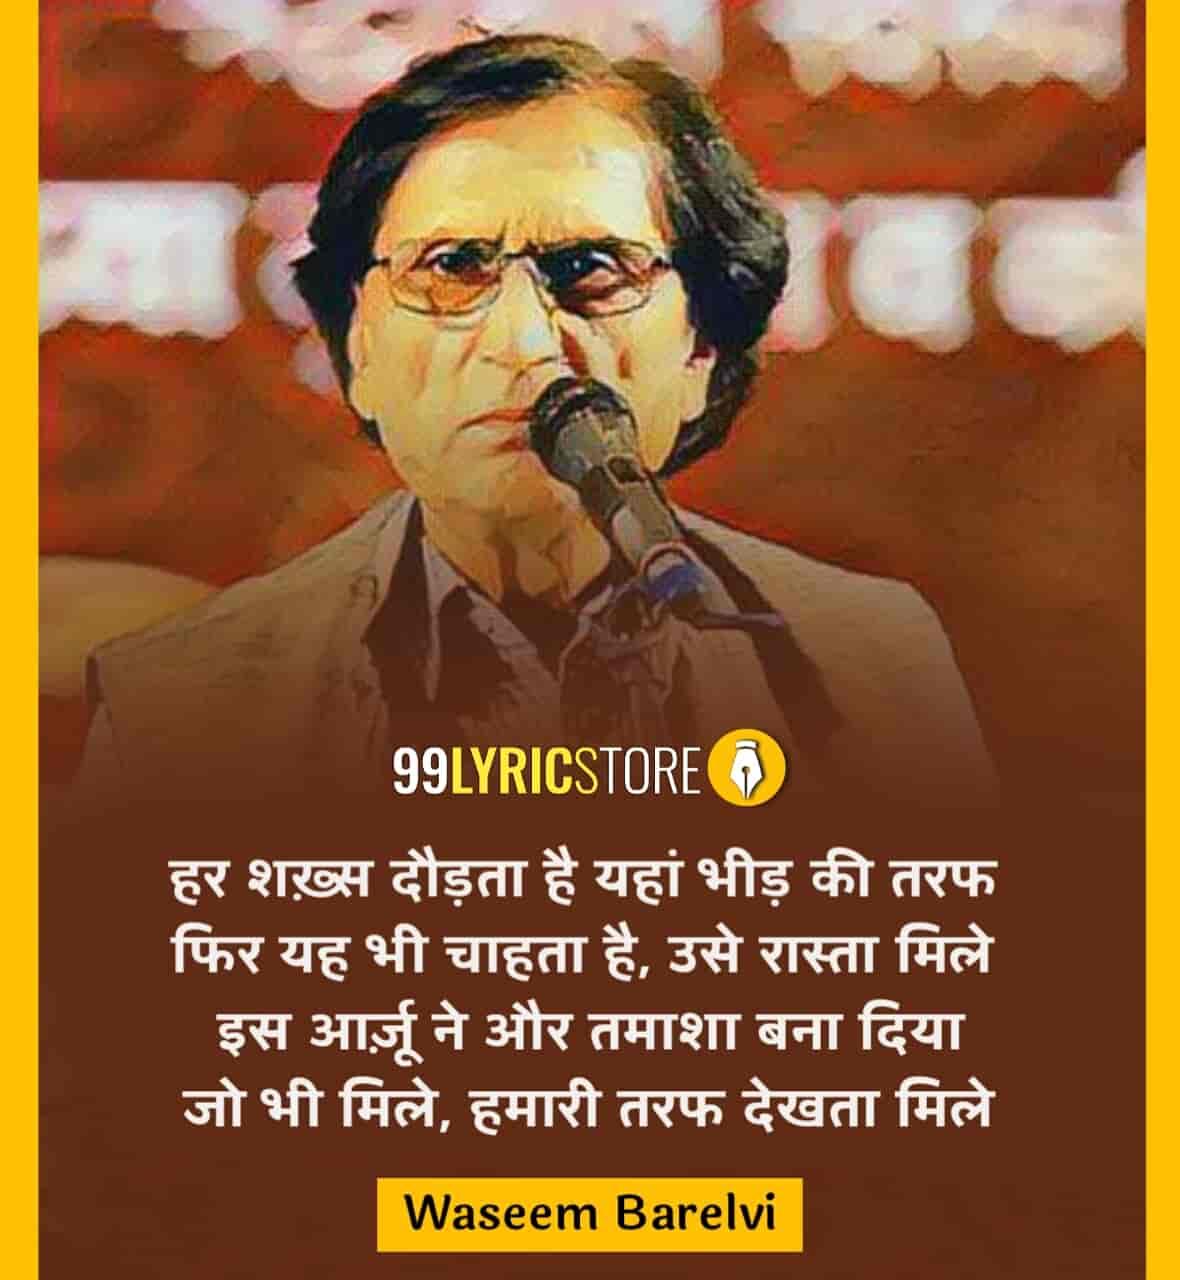 This beautiful ghazal 'Qatra ab Ehitjaaj Kare Bhi , To Kya Mile' has written by Waseem Barelvi.